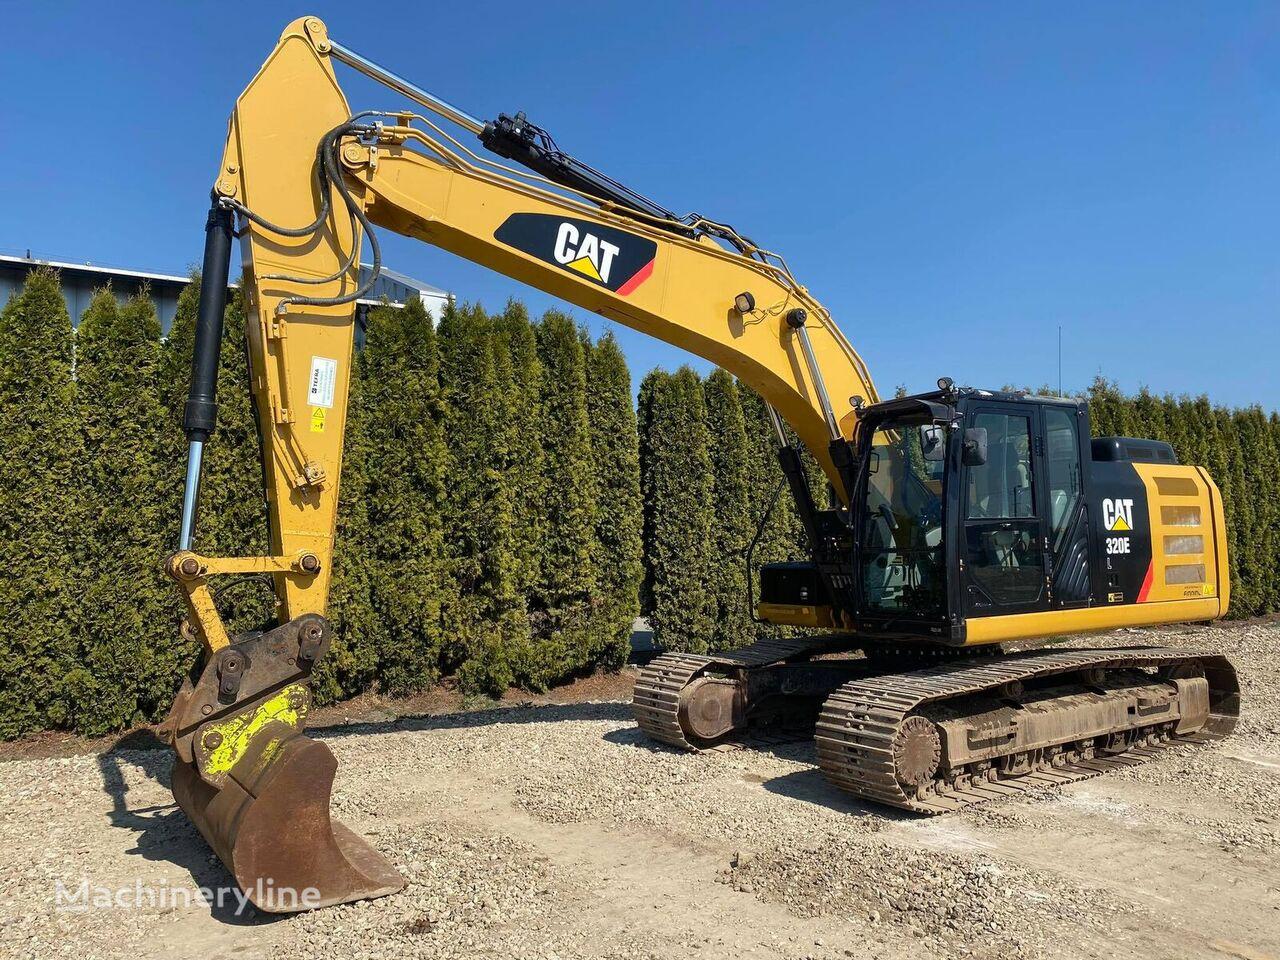 CATERPILLAR 320 EL tracked excavator